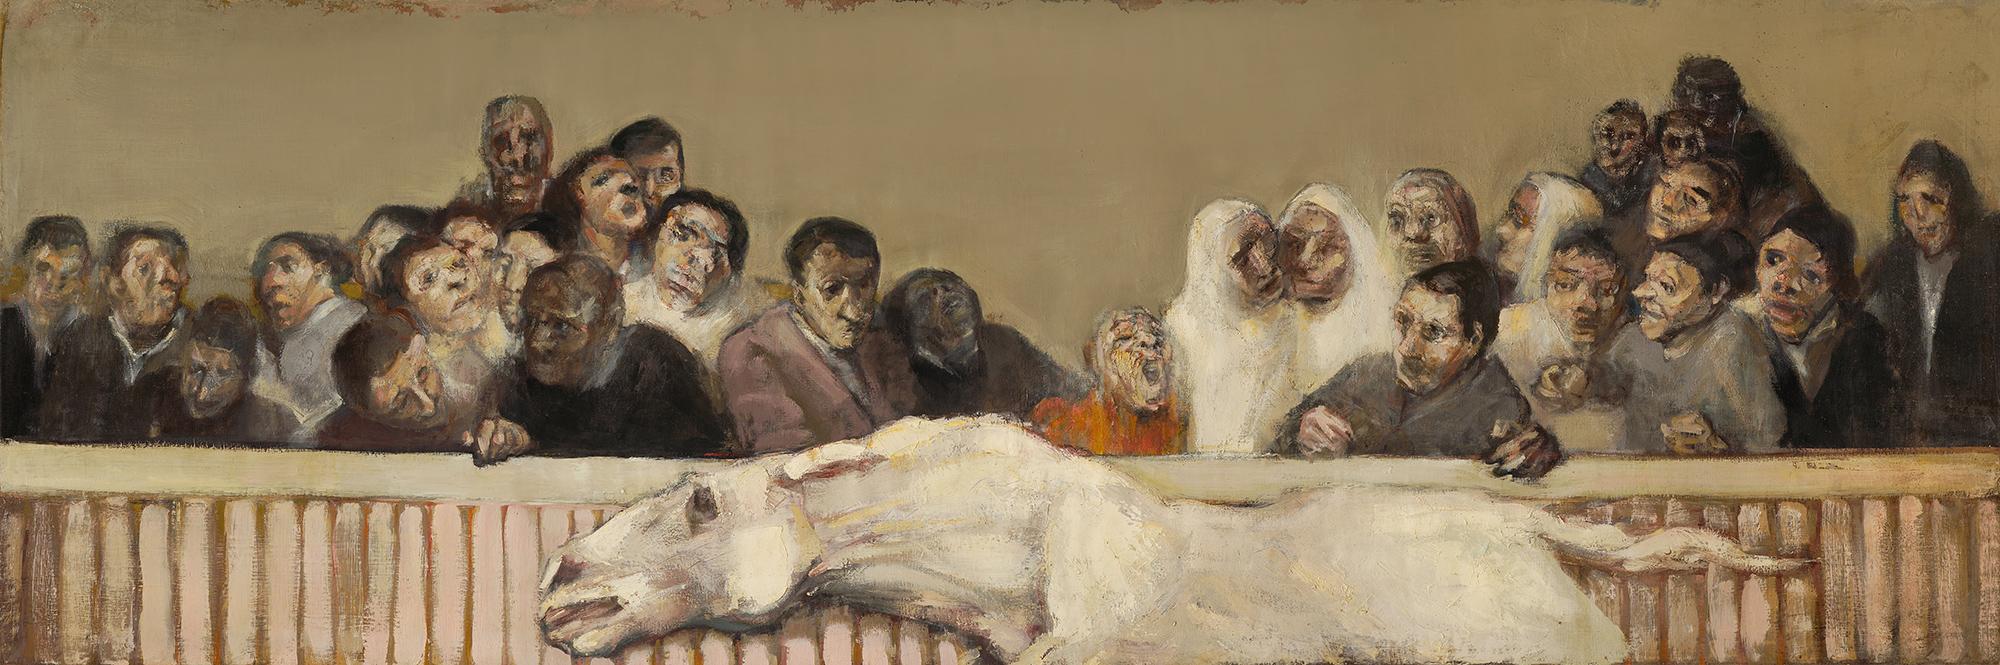 Corrida  1955-6, 100 x 300 cm, oil on canvas (Tate Britain)